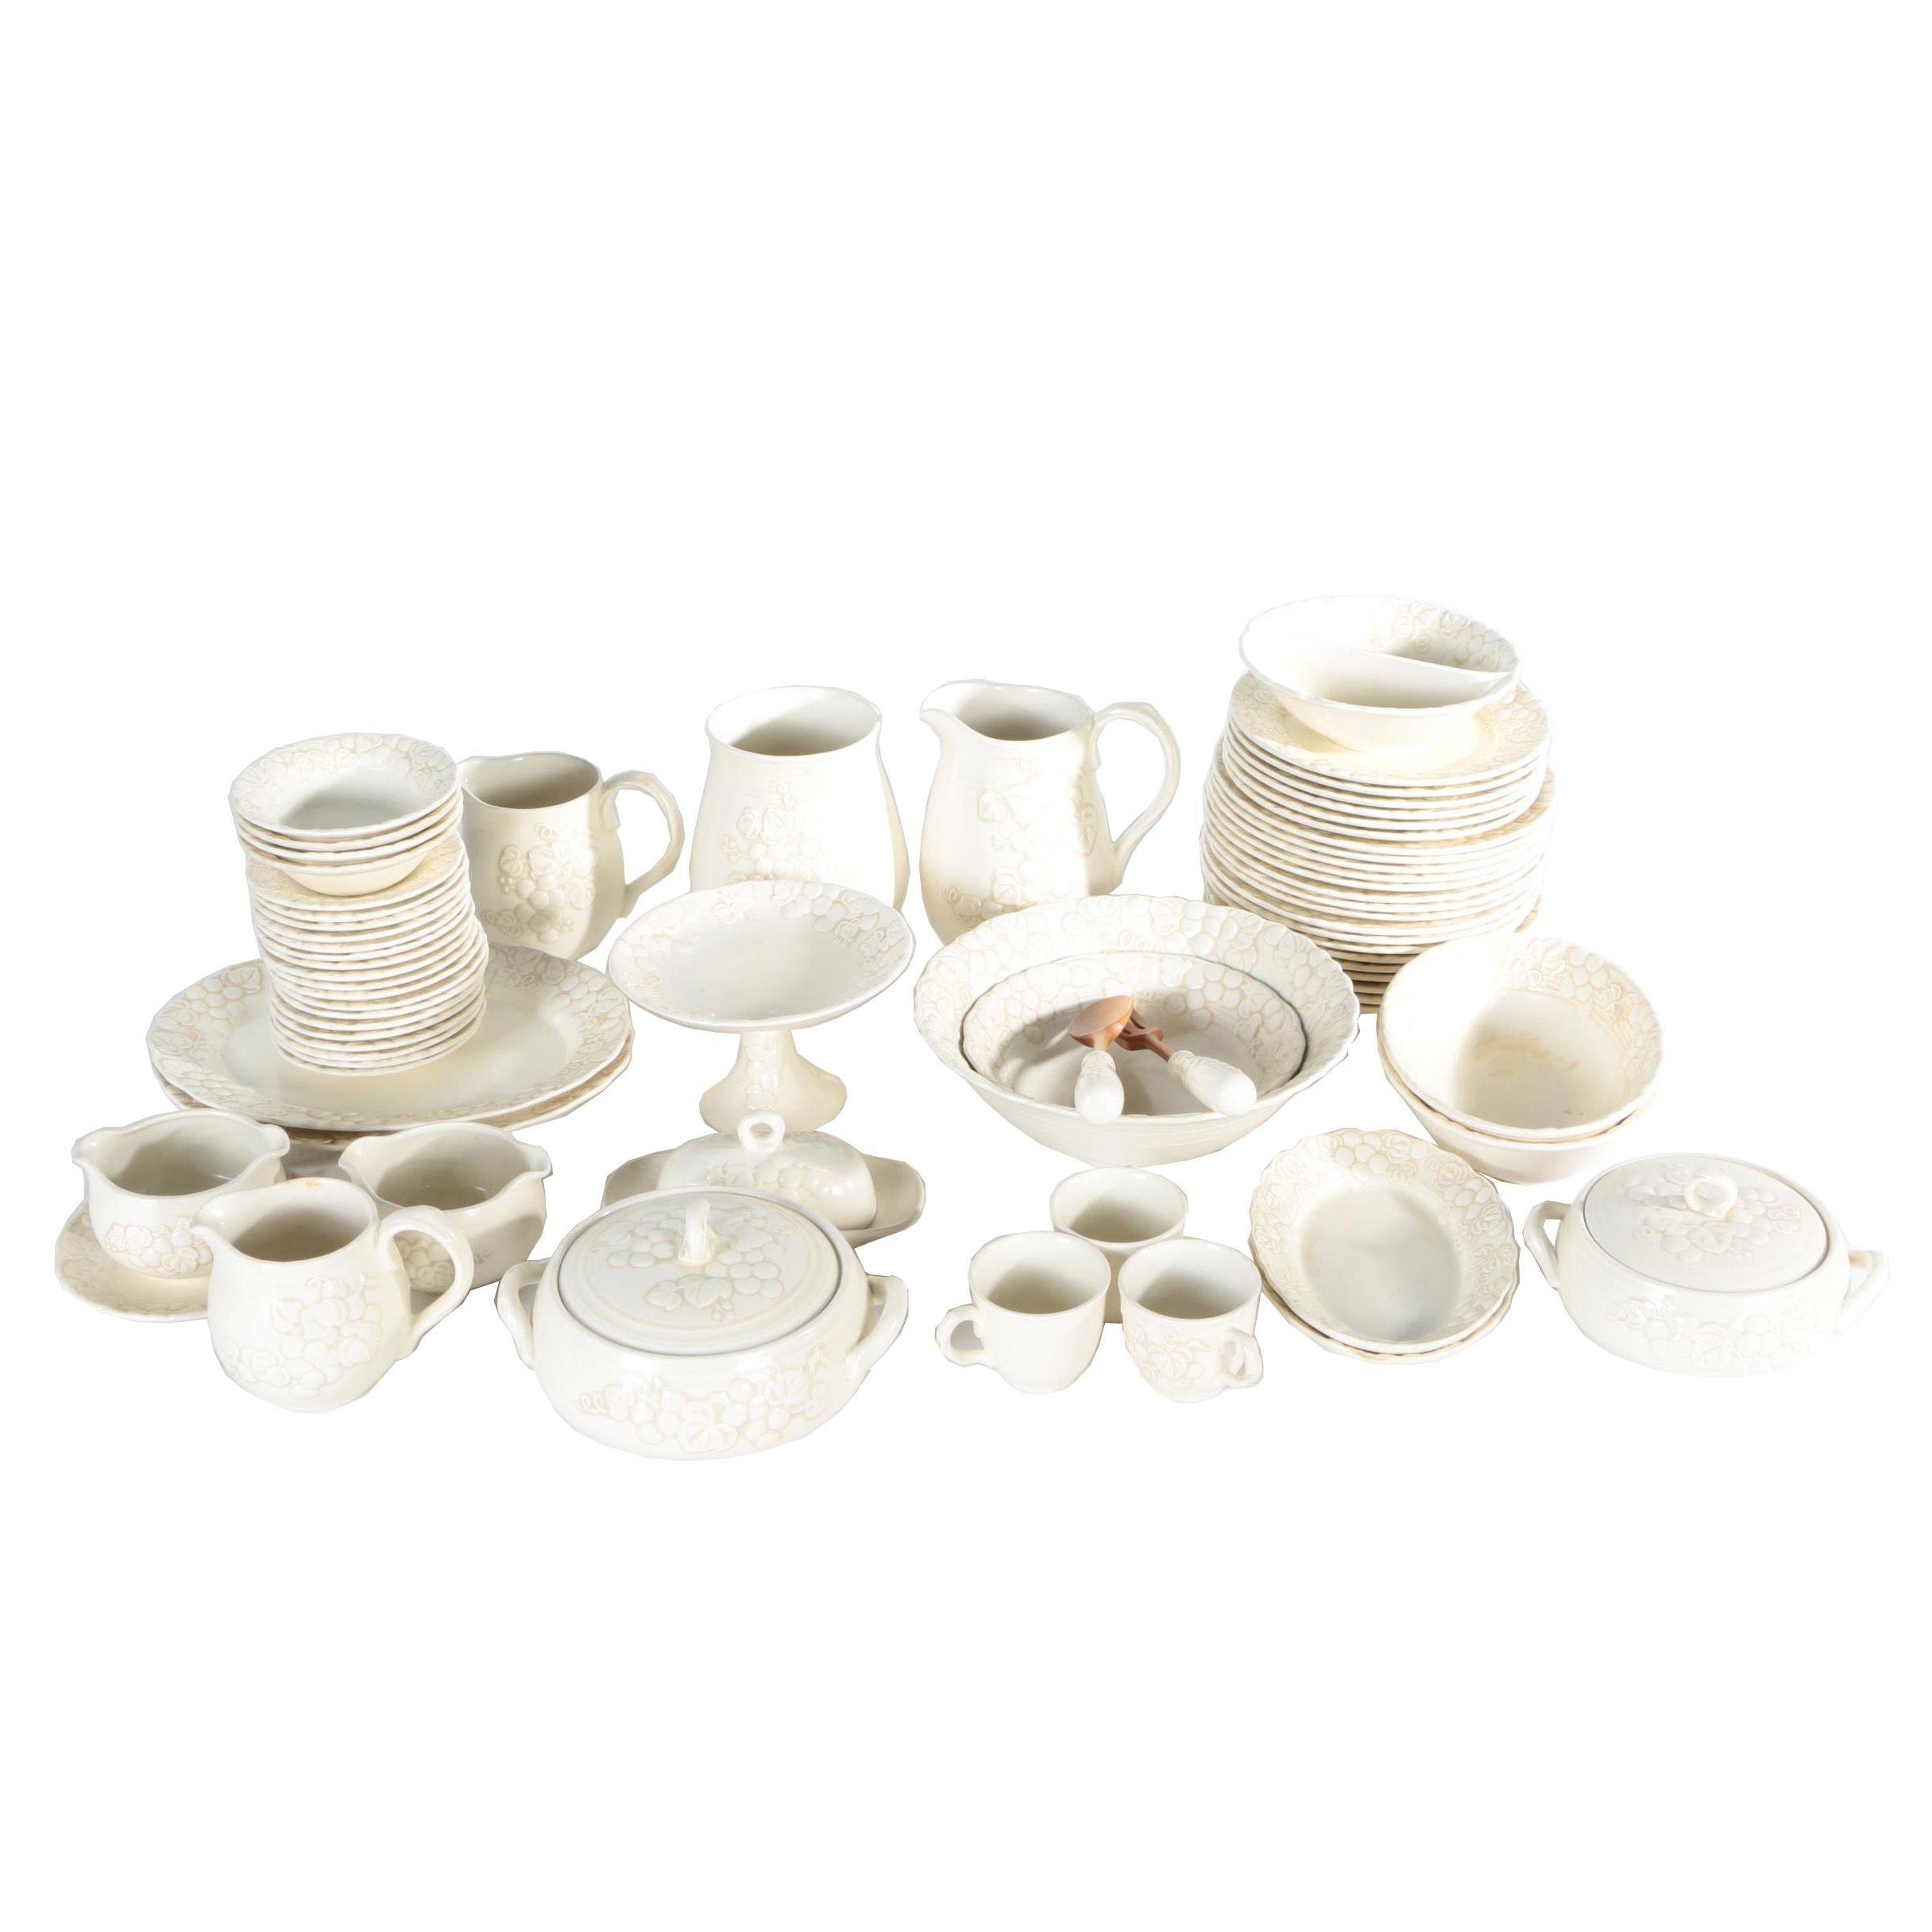 Metlox Stoneware Tableware